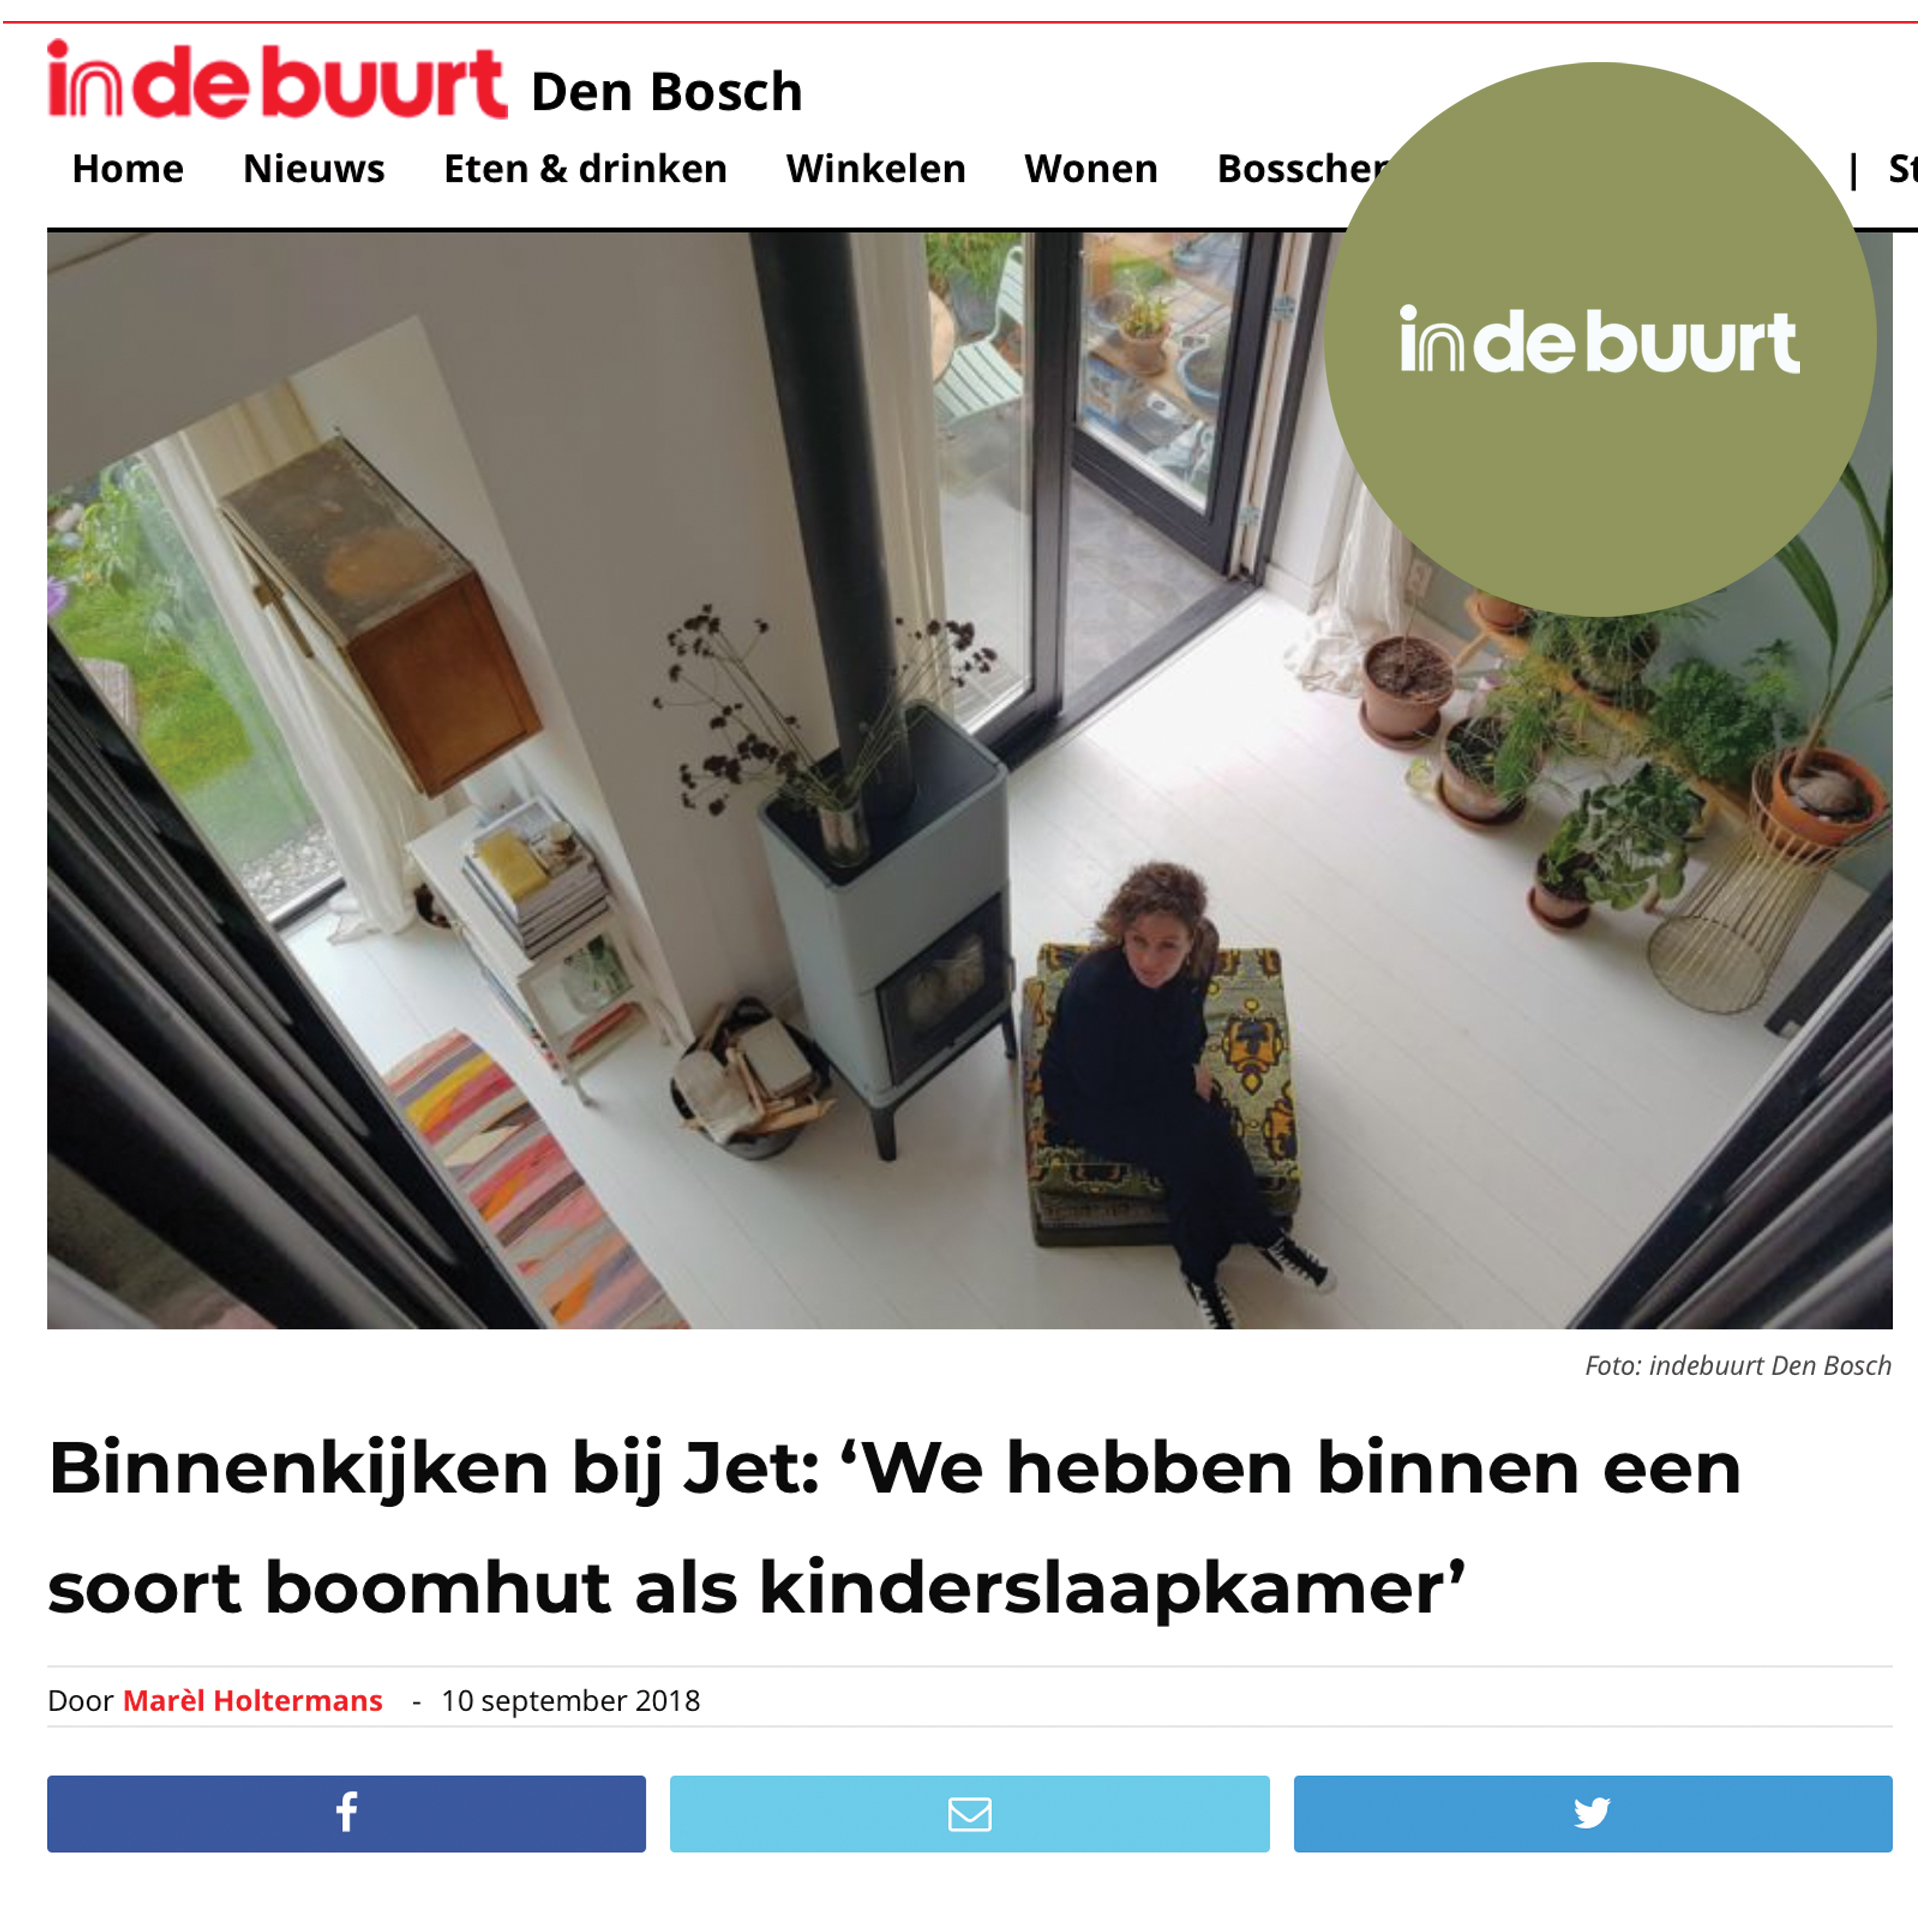 // interview in de buurt-Den Bosch